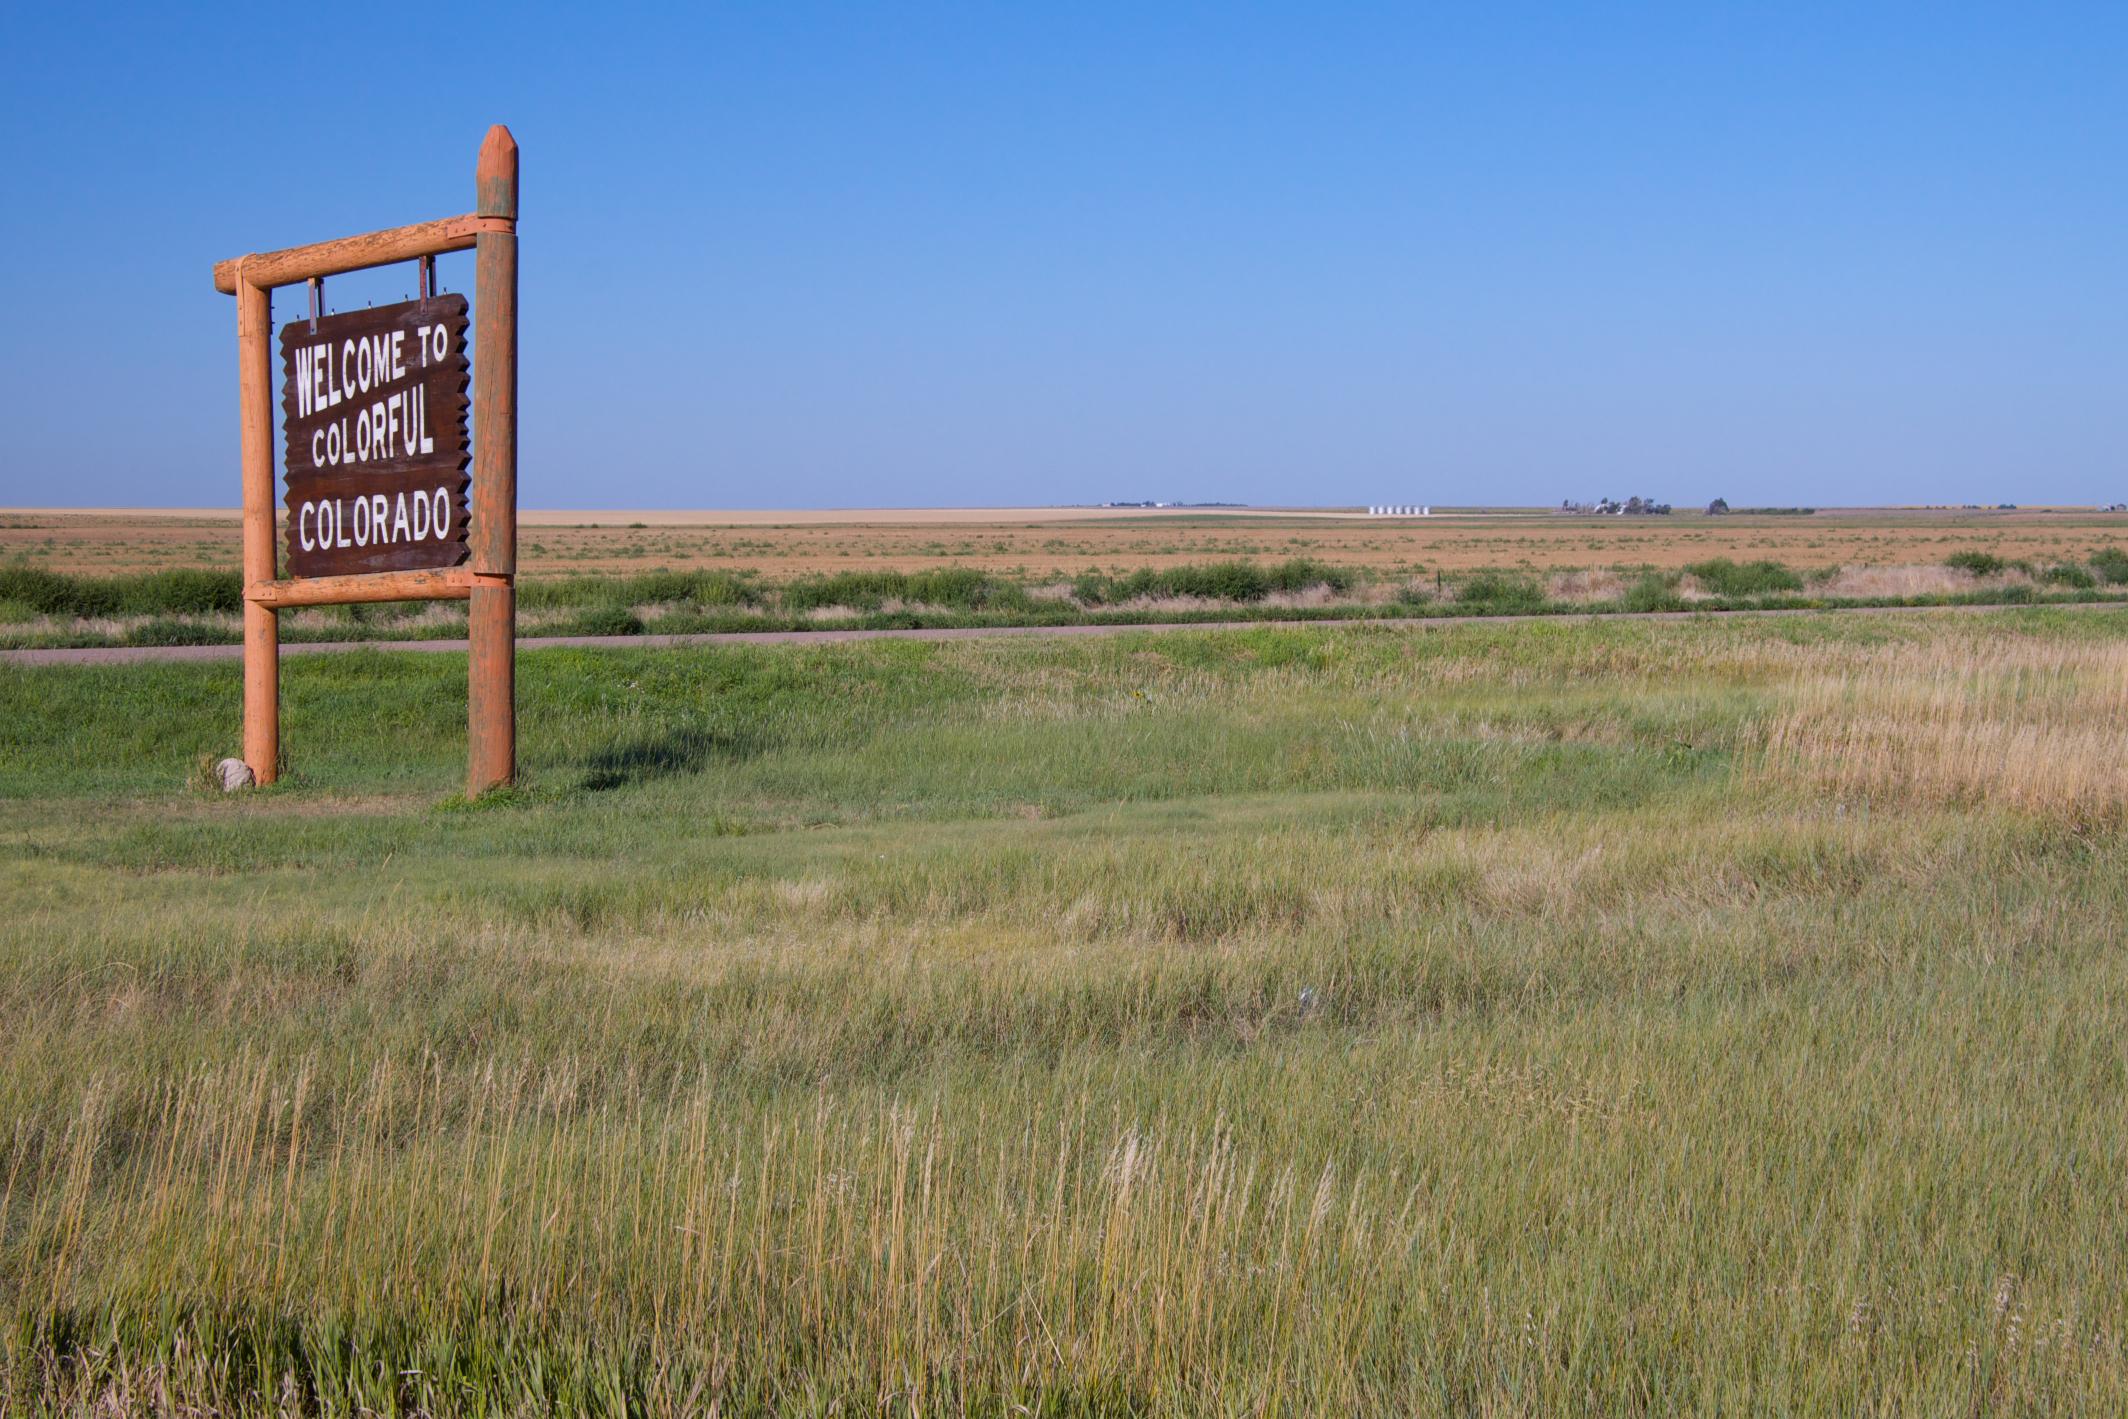 Colo. 96, Kiowa County